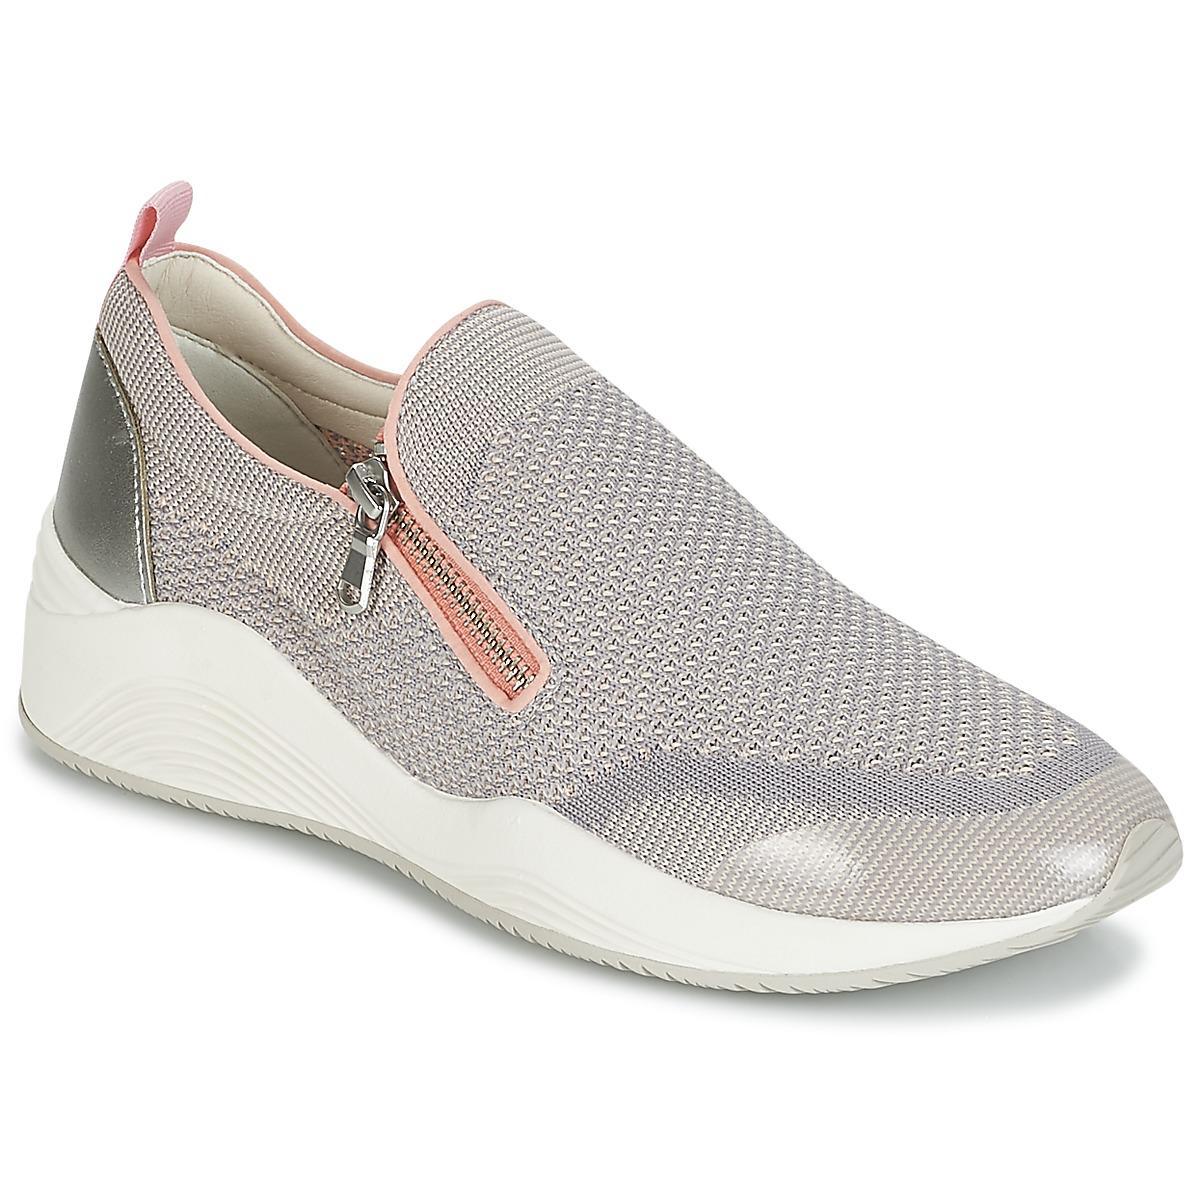 ec107b963d572 Geox D Omaya C Women's Shoes (trainers) In Grey in Gray - Lyst